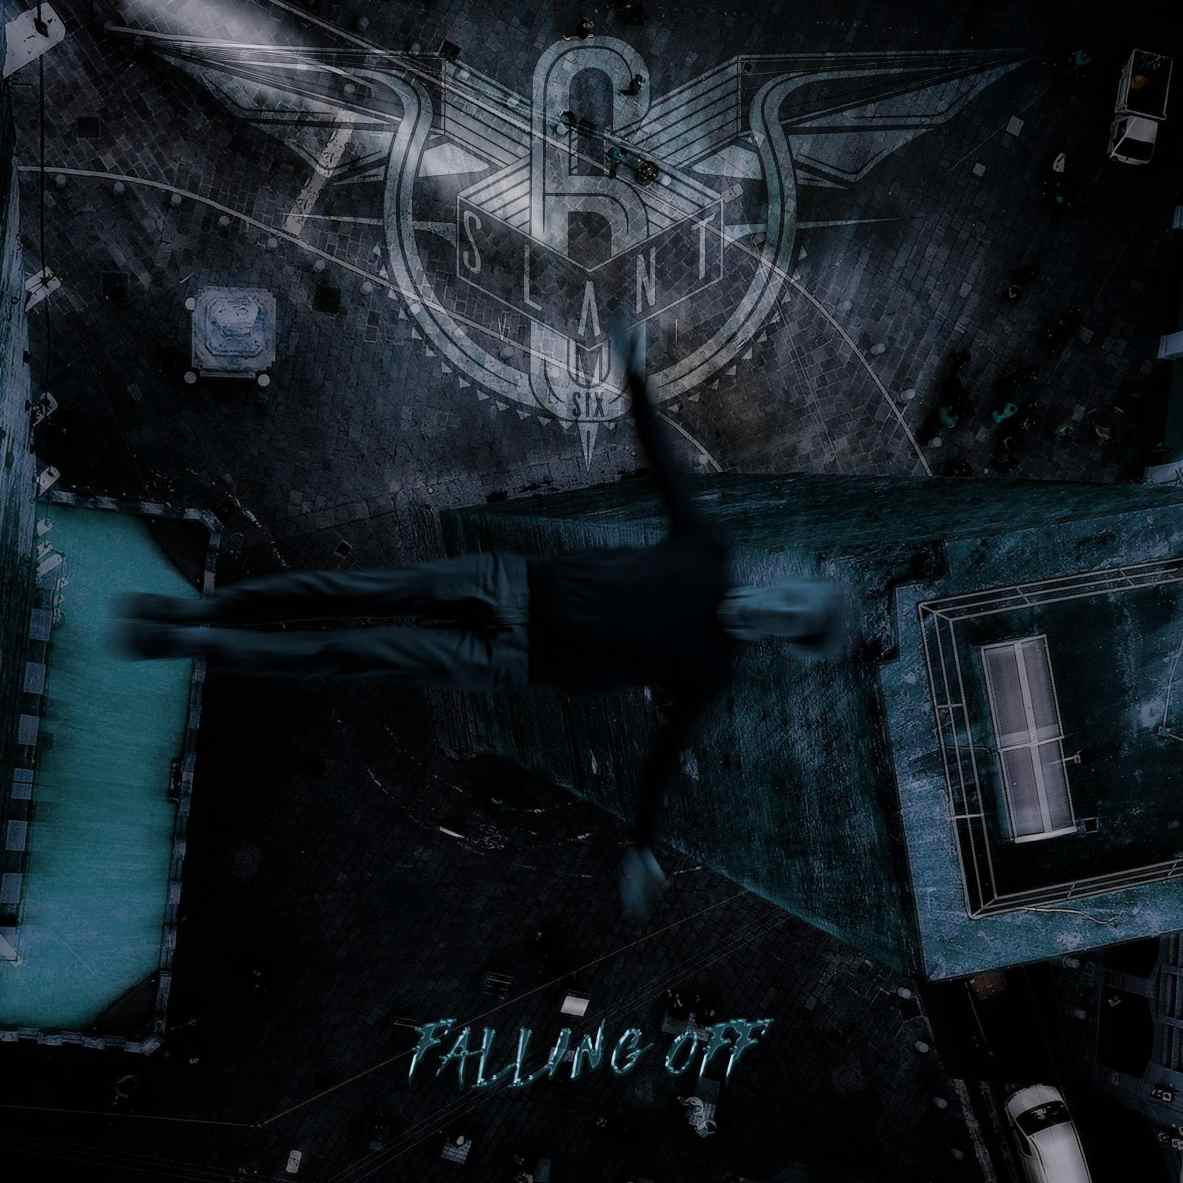 Falling Off - New single from Slant Six